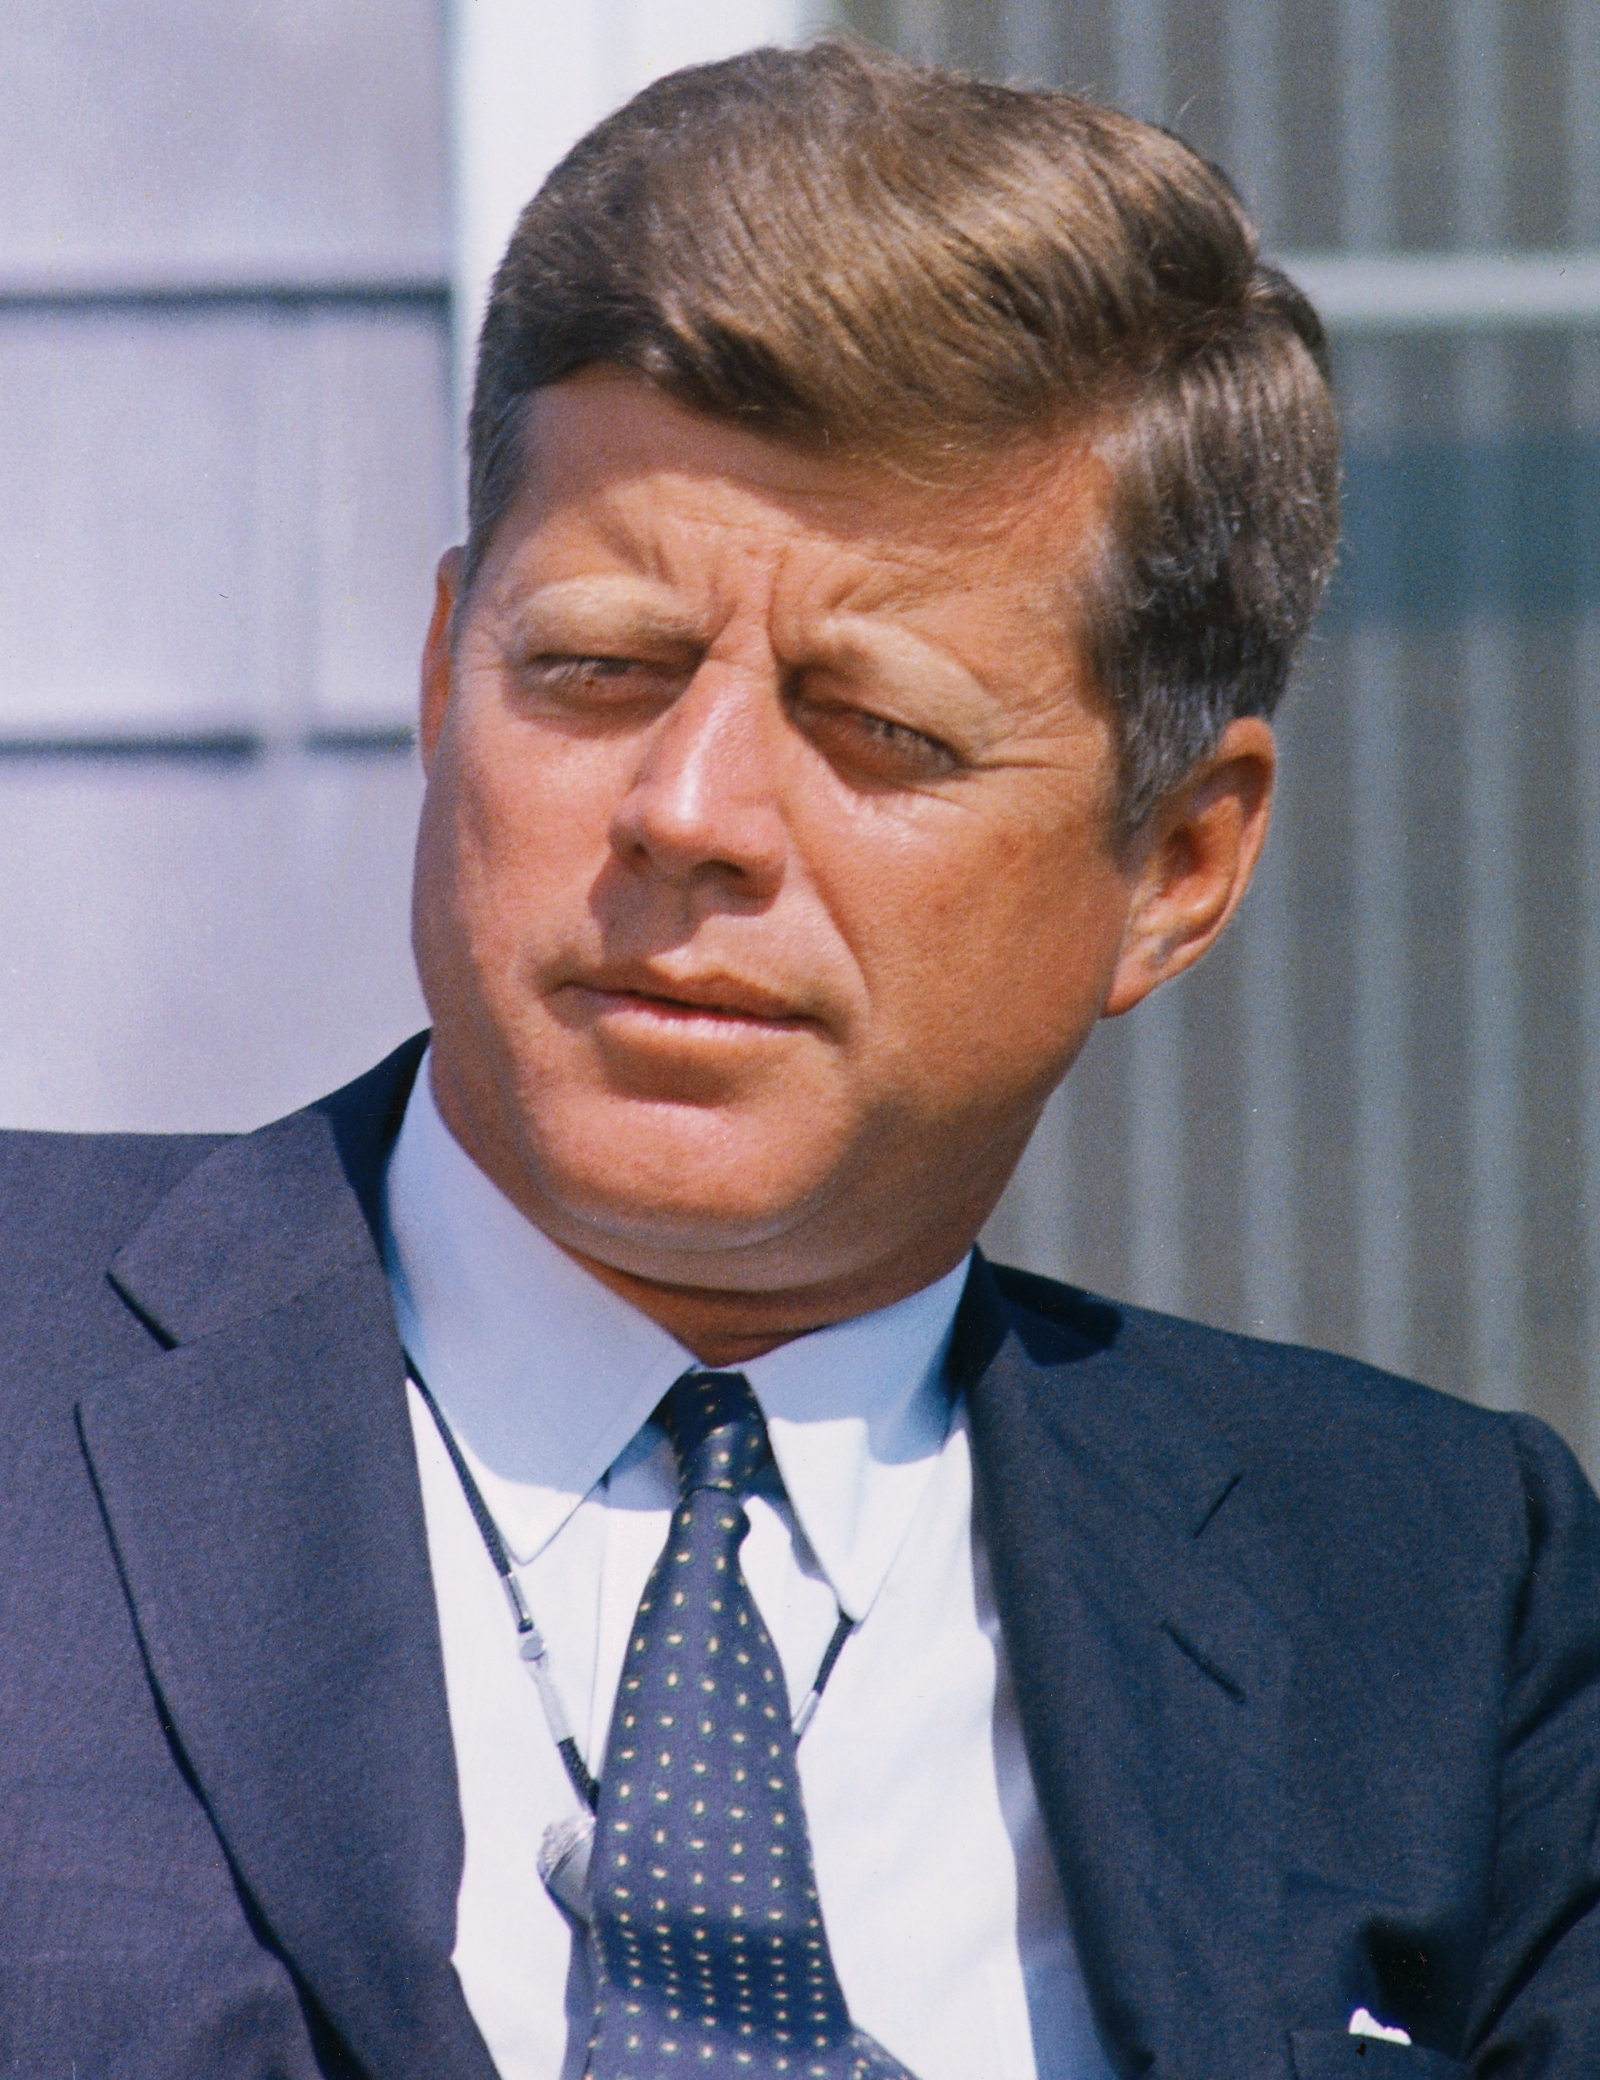 President interviewed by Walter Cronkite. President Kennedy ( close-up ). Hyannisport, MA, Squaw Island. - NARA - 194259 (edit).jpg